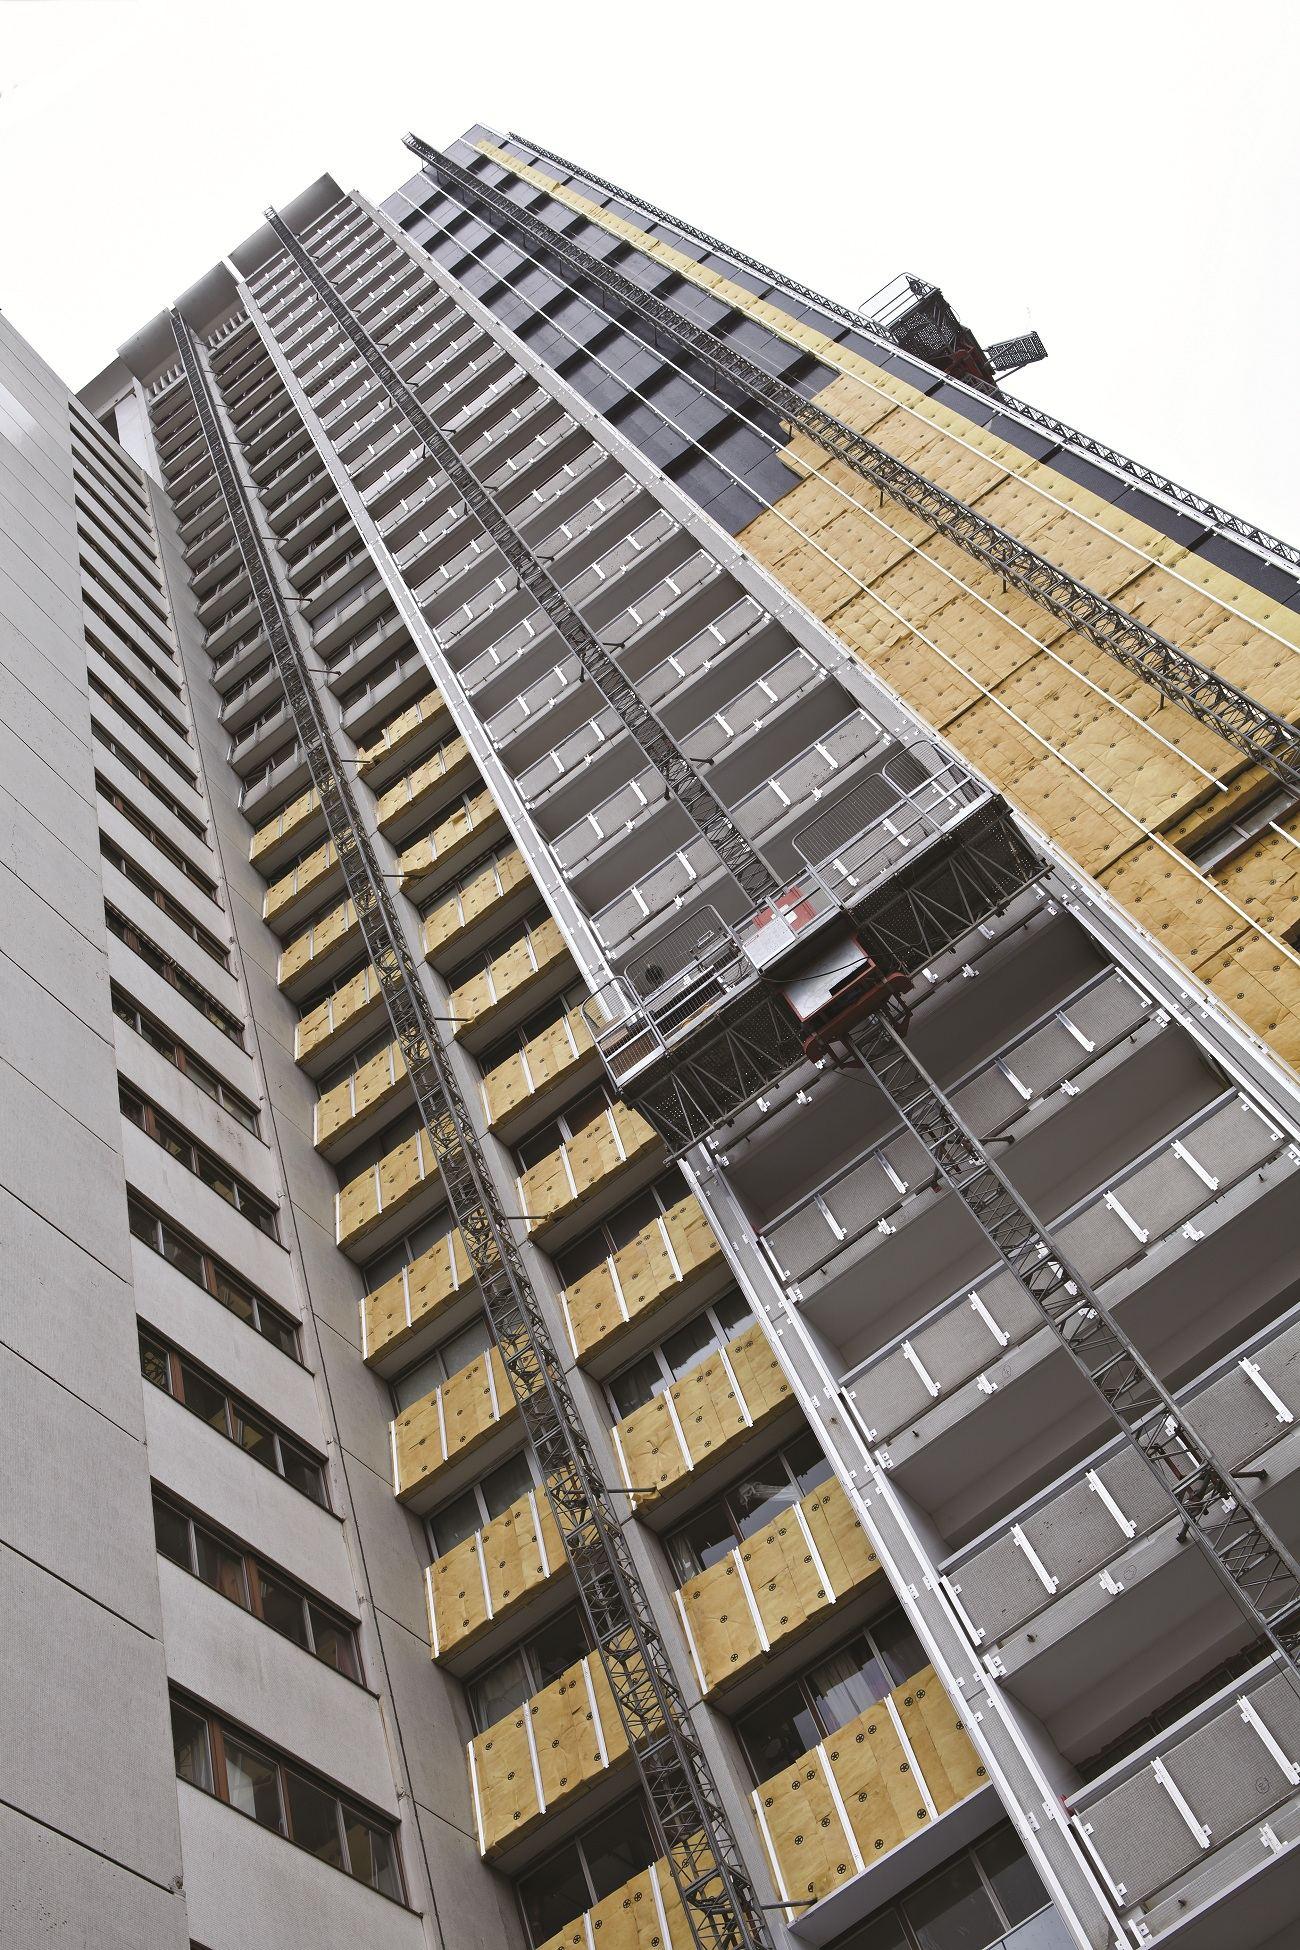 TourSuperMontparnasse Travaux1 compressed - Isover rénove la tour Super-Montparnasse